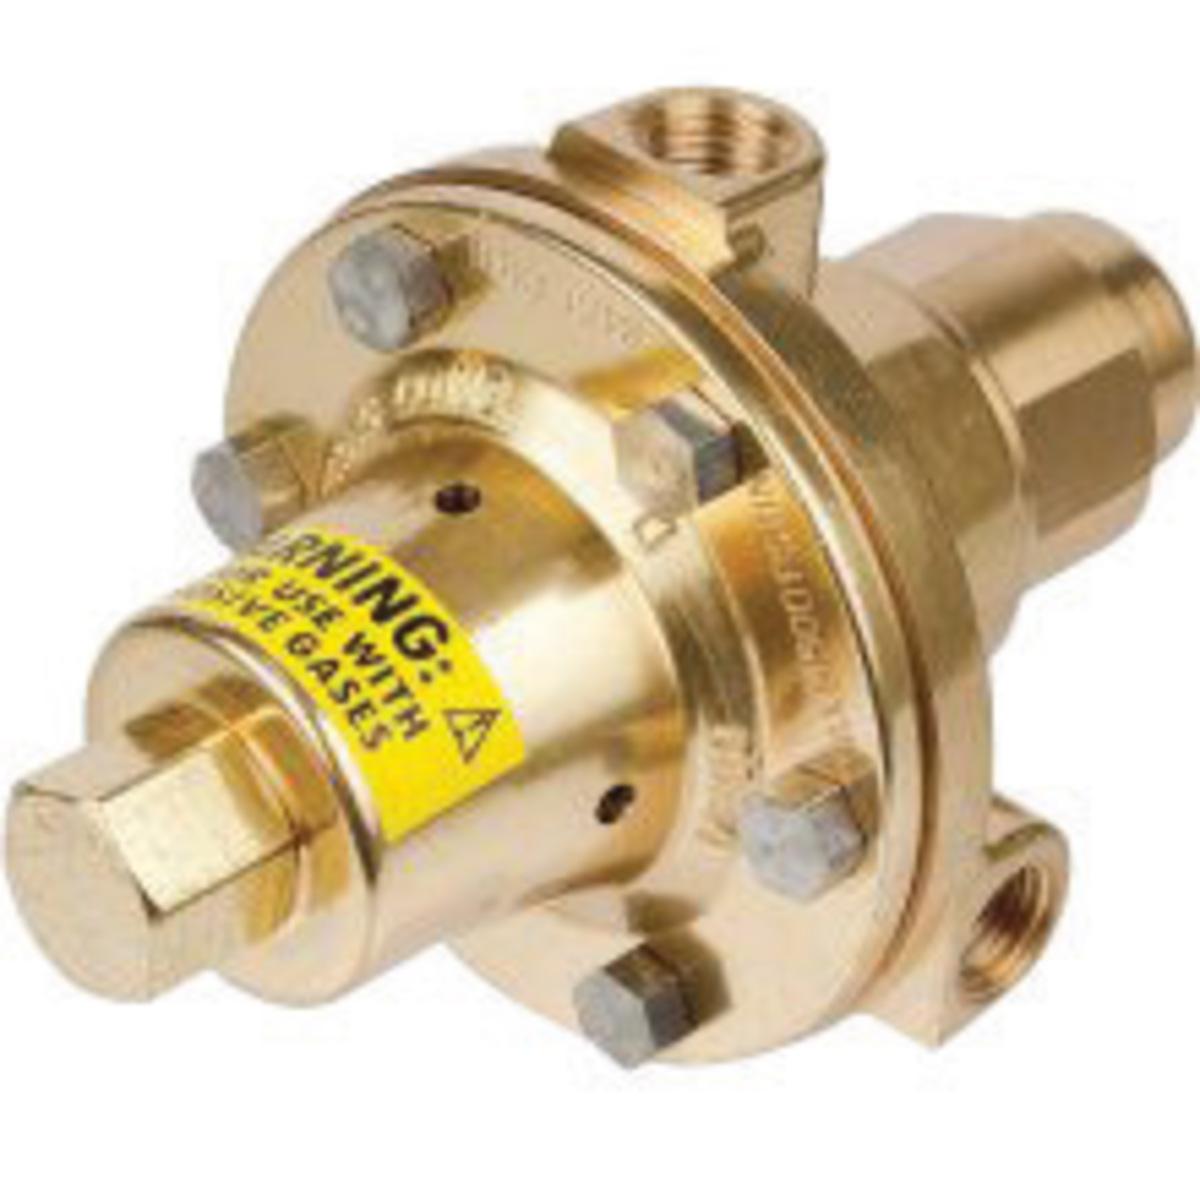 High Pressure Regulator : Airgas vic victor p series high pressure